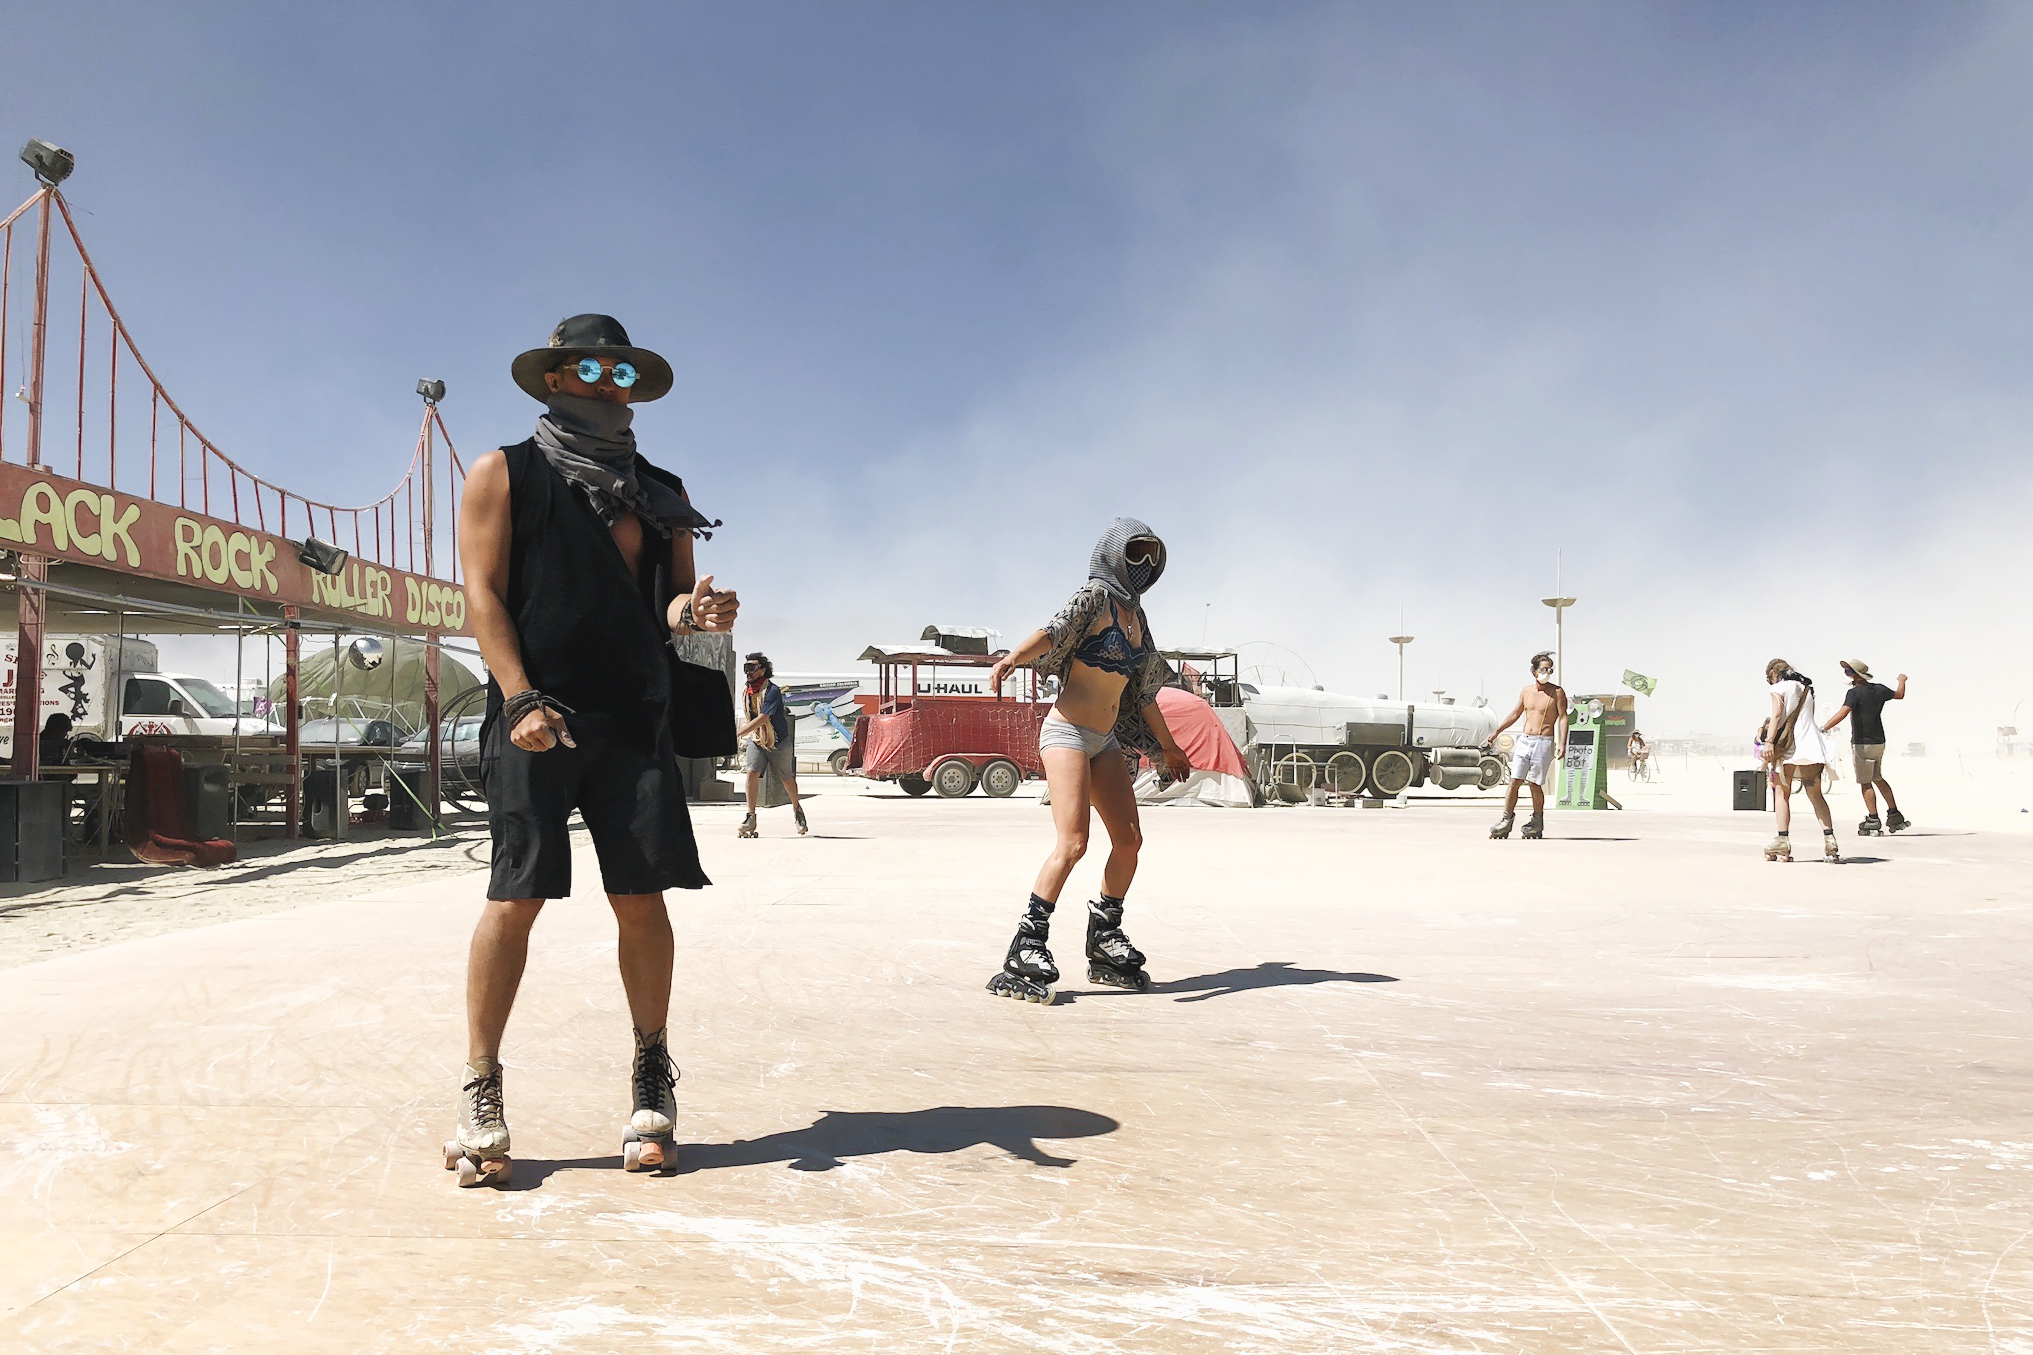 Roller skating on the Playa